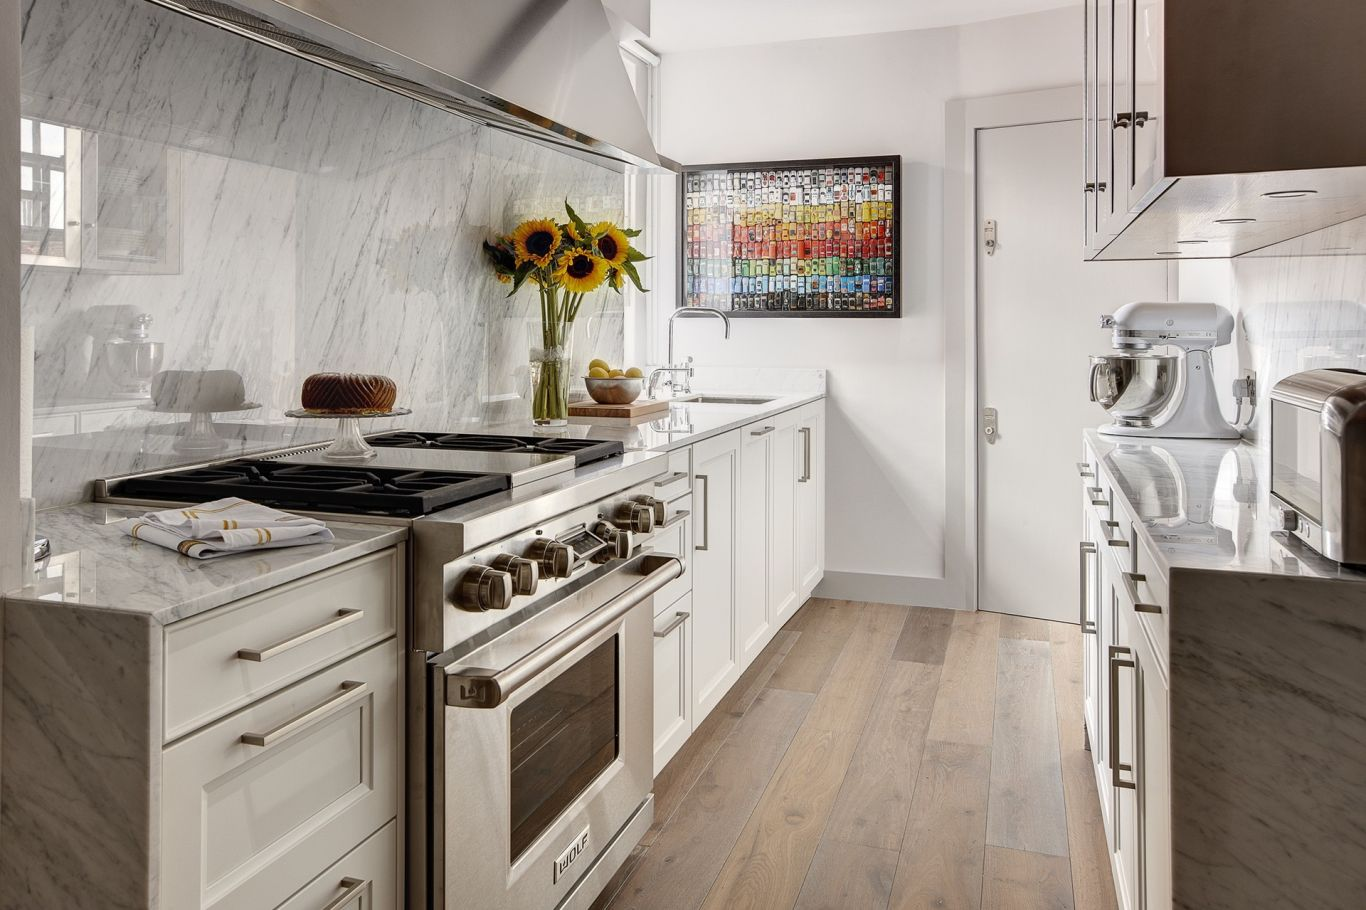 Bespoke kitchen design with automation